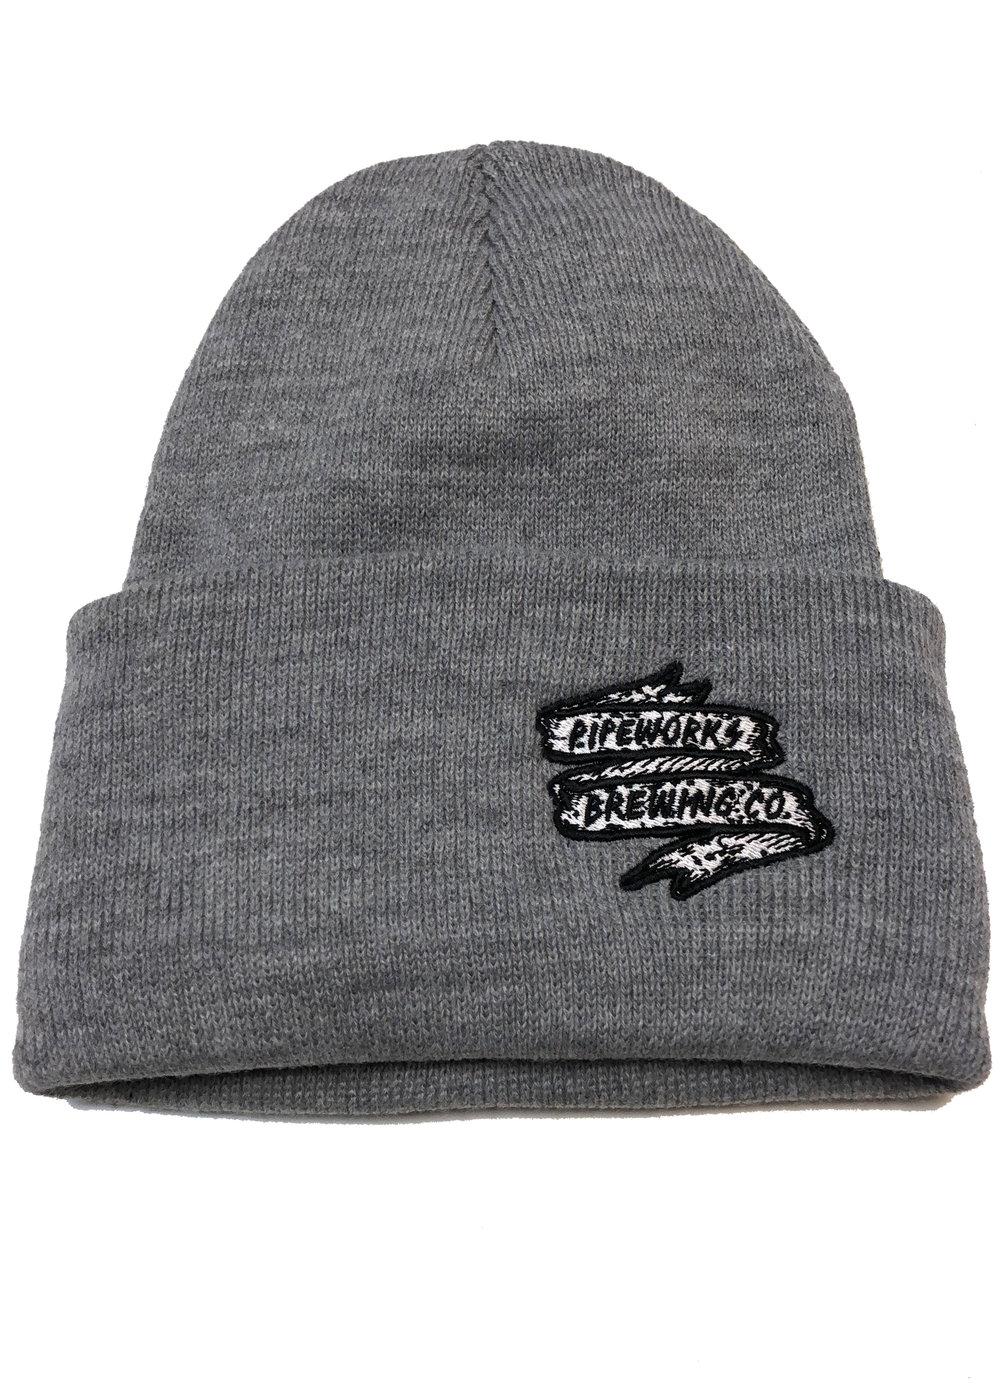 grey_hat.jpg